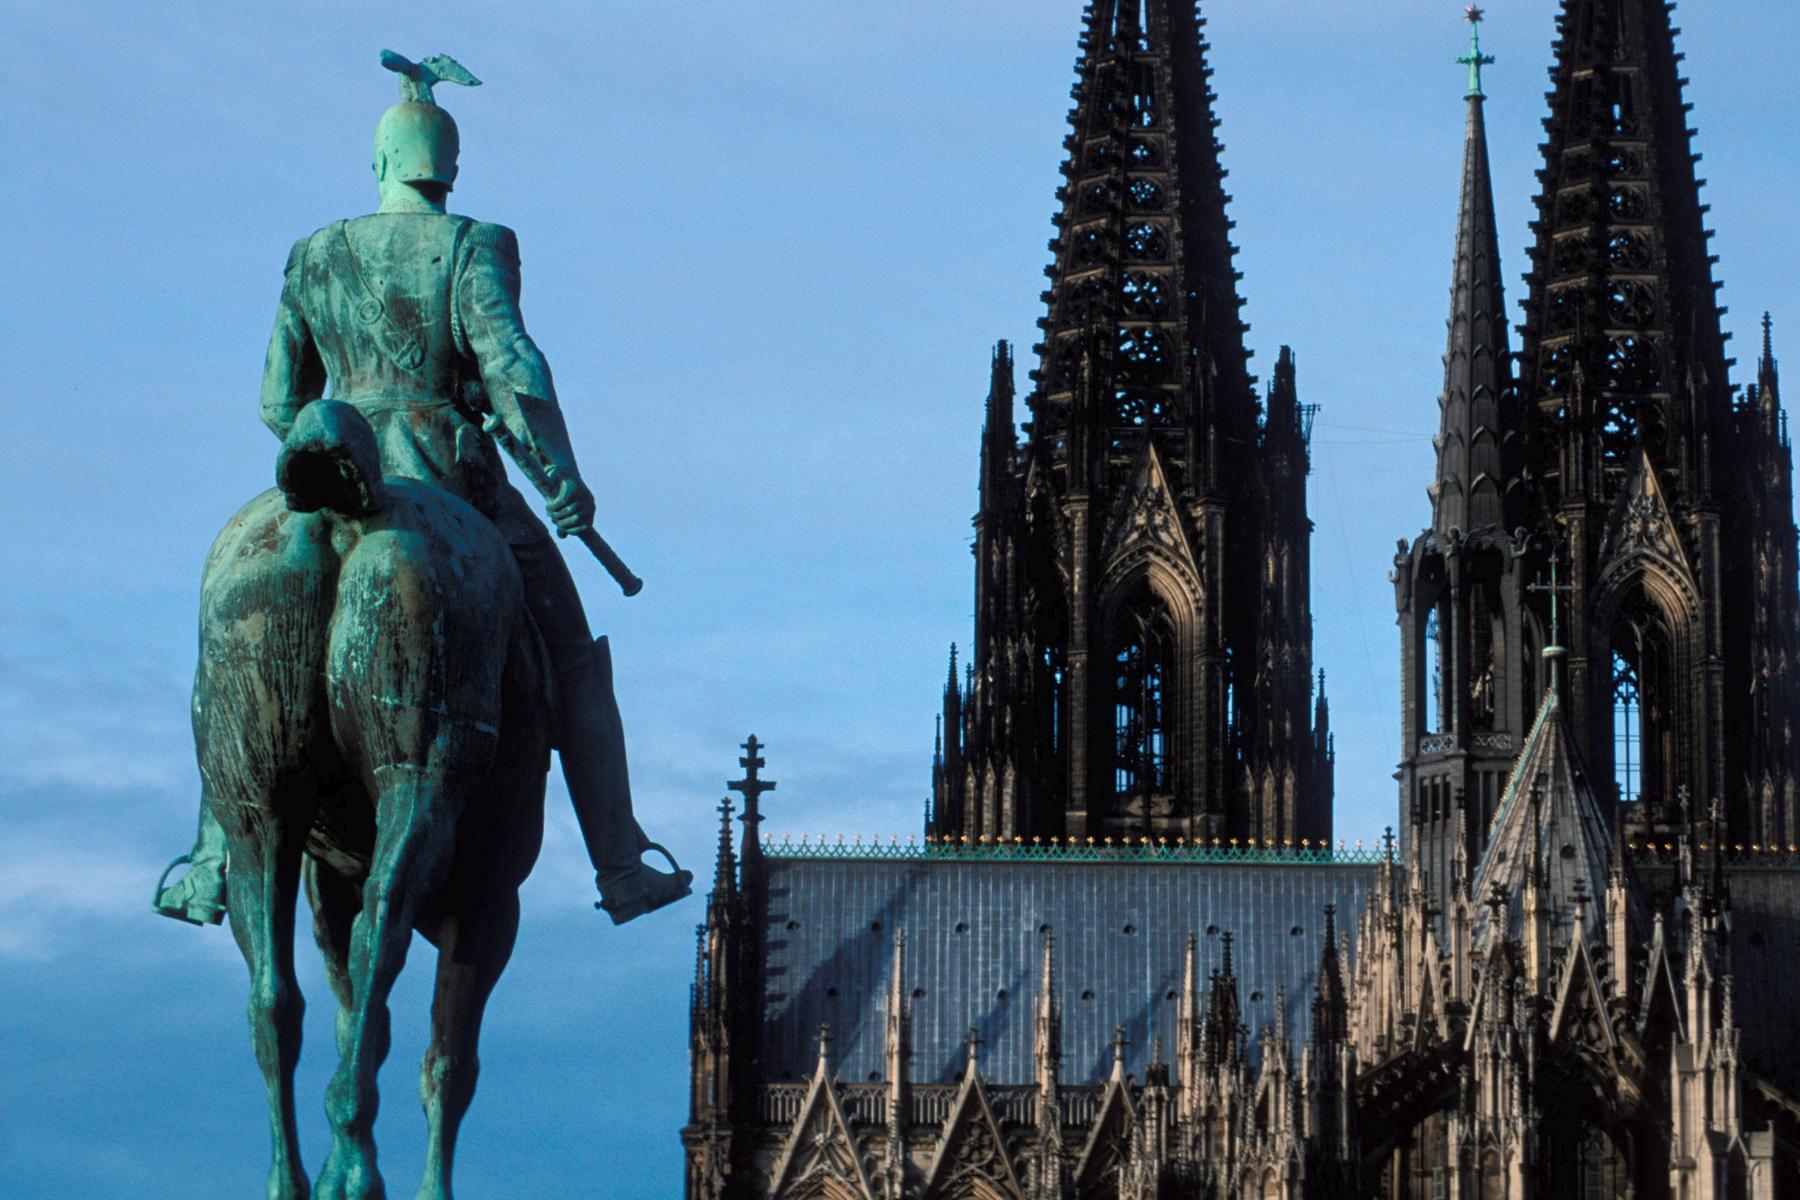 Immobilien Köln Dom mit Statue